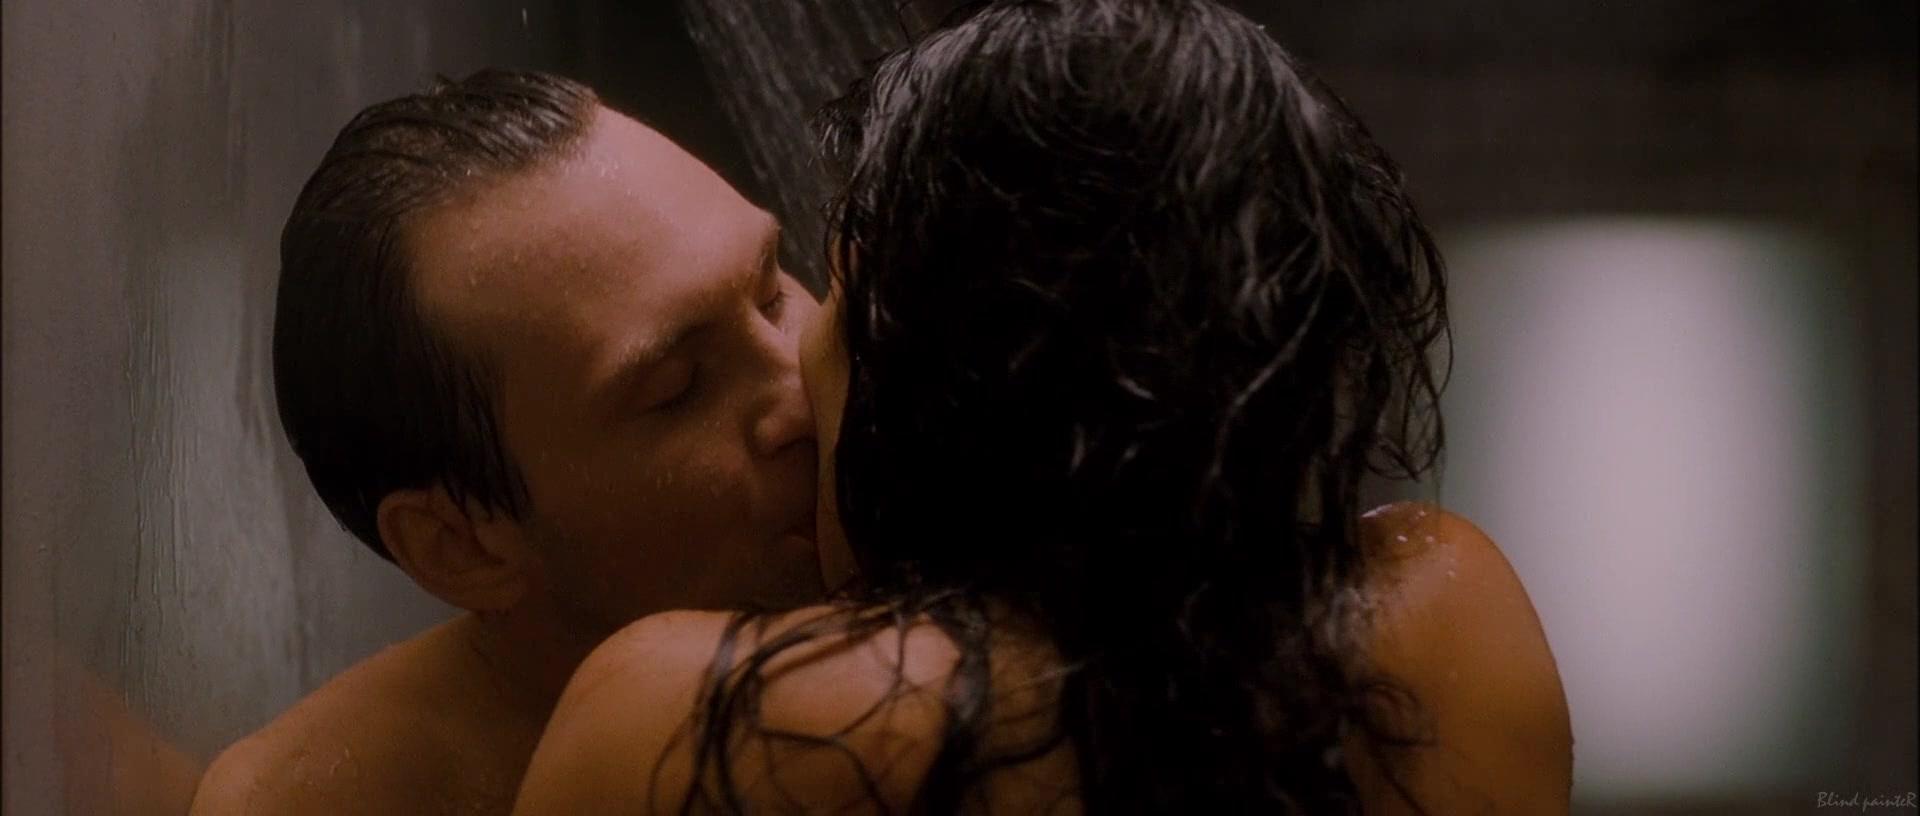 Consider, that Patricia velasquez nude hot for